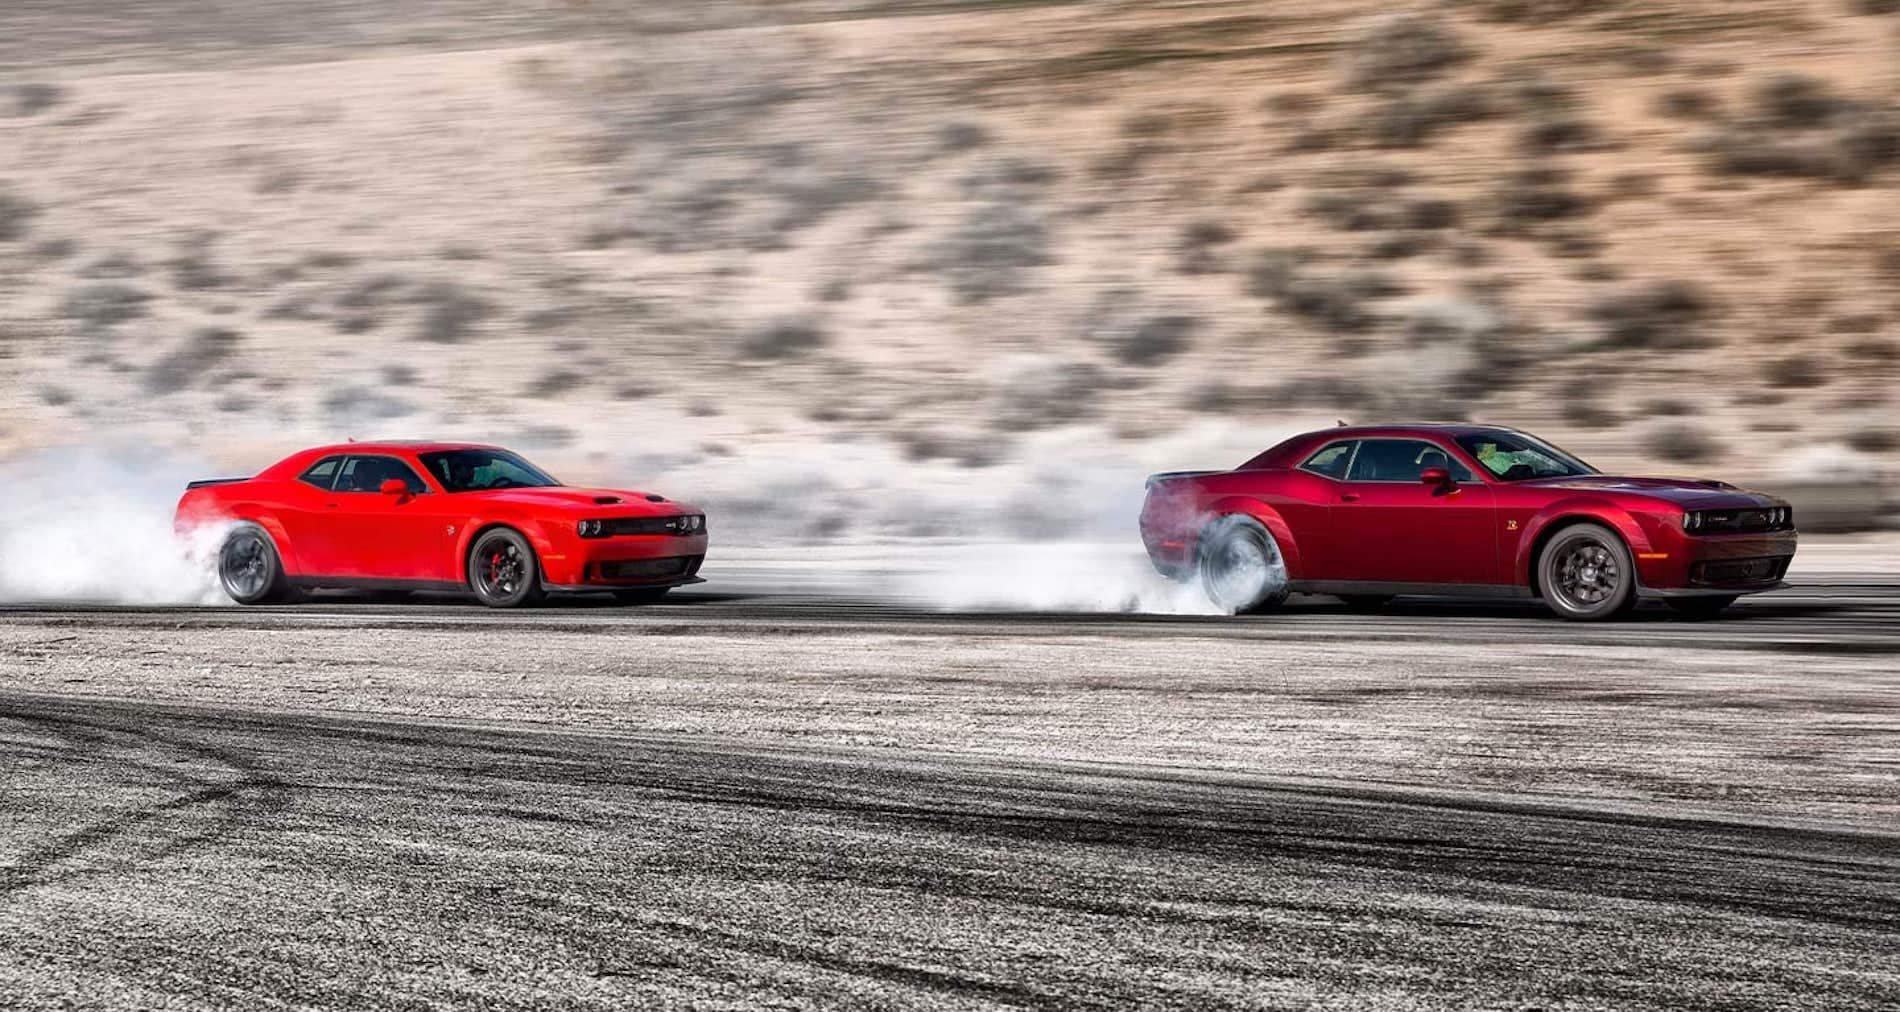 2021 Dodge Challenger performance and horsepower